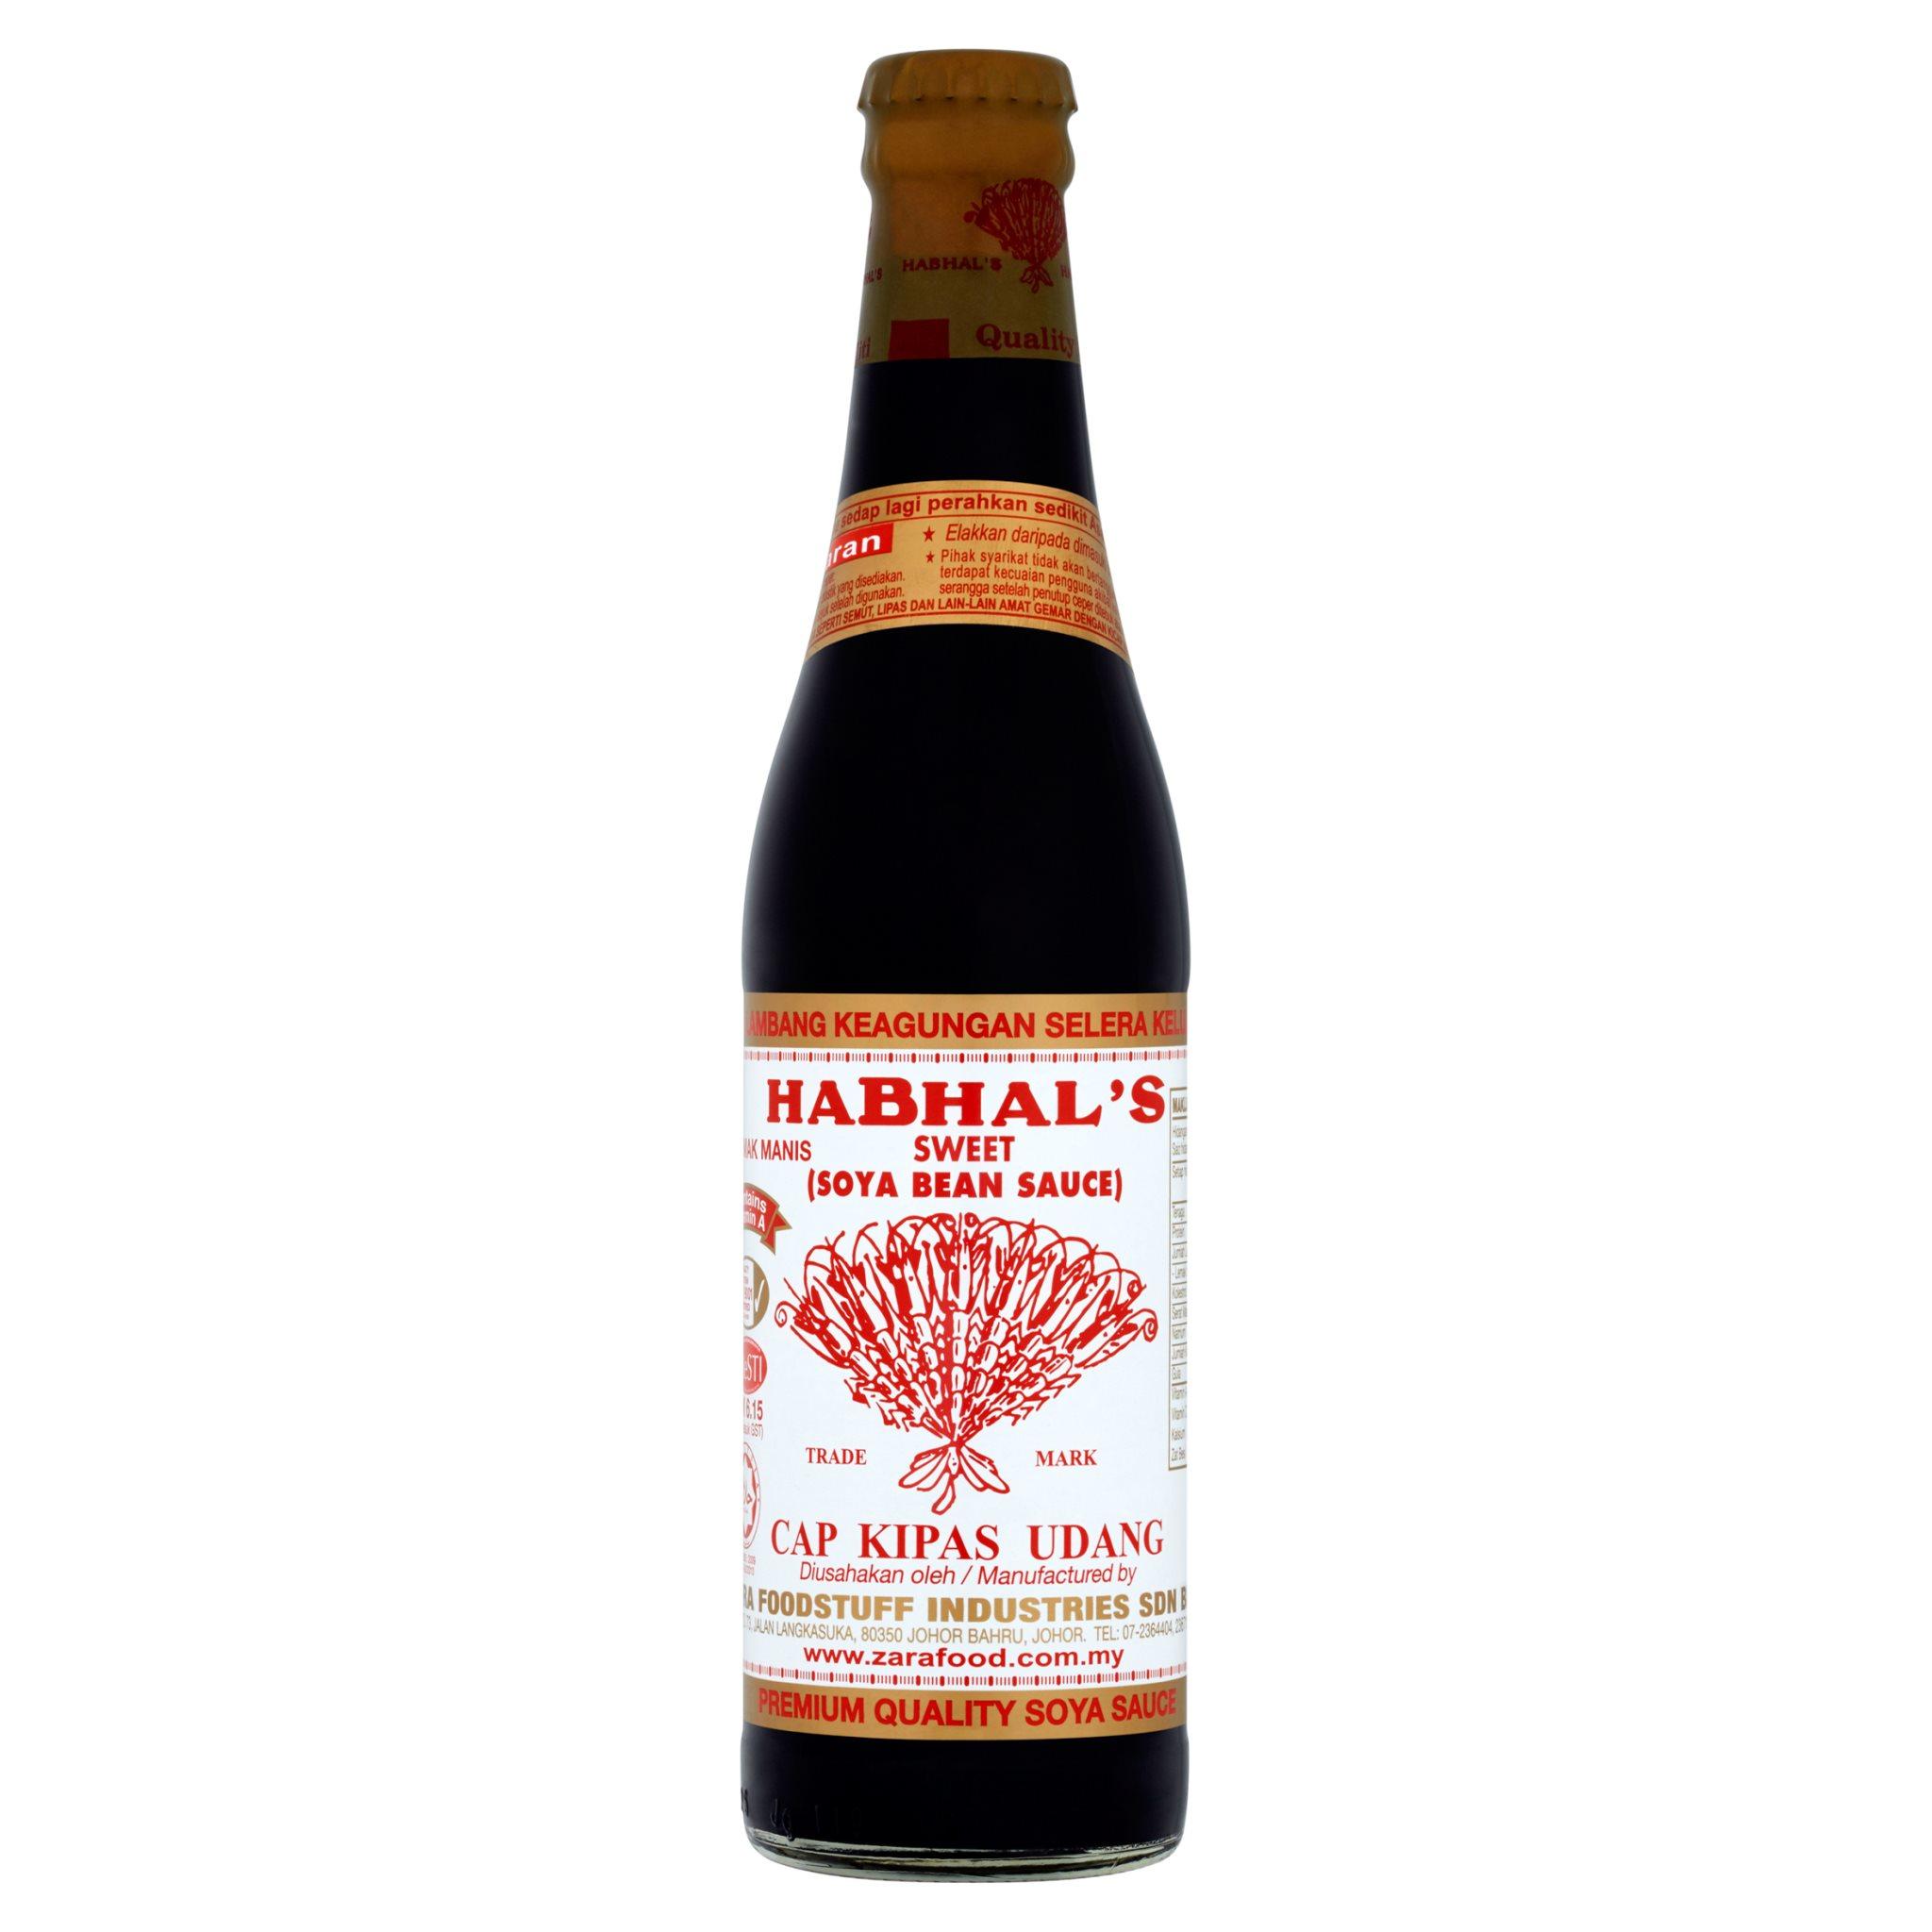 Habhals Cap Kipas Udang Sweet Soya Bean Sauce 345ml